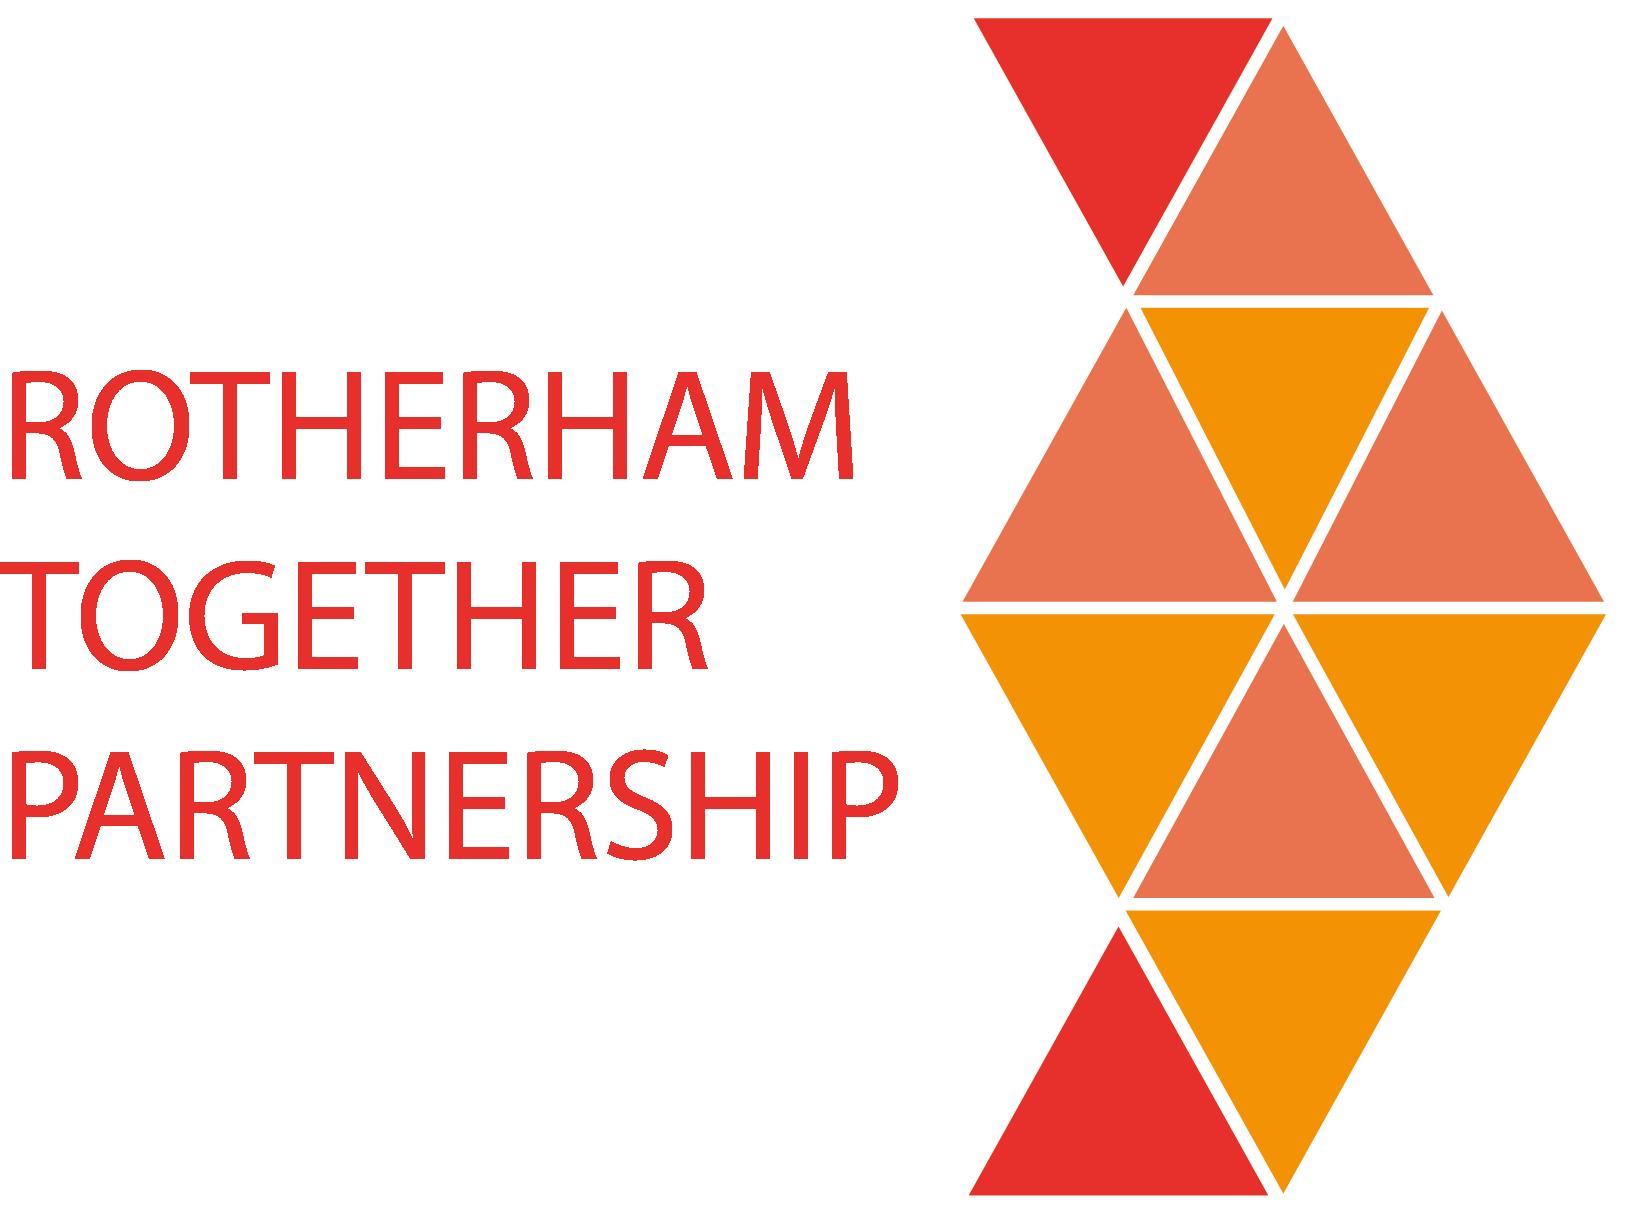 Rotherham Together Partnership